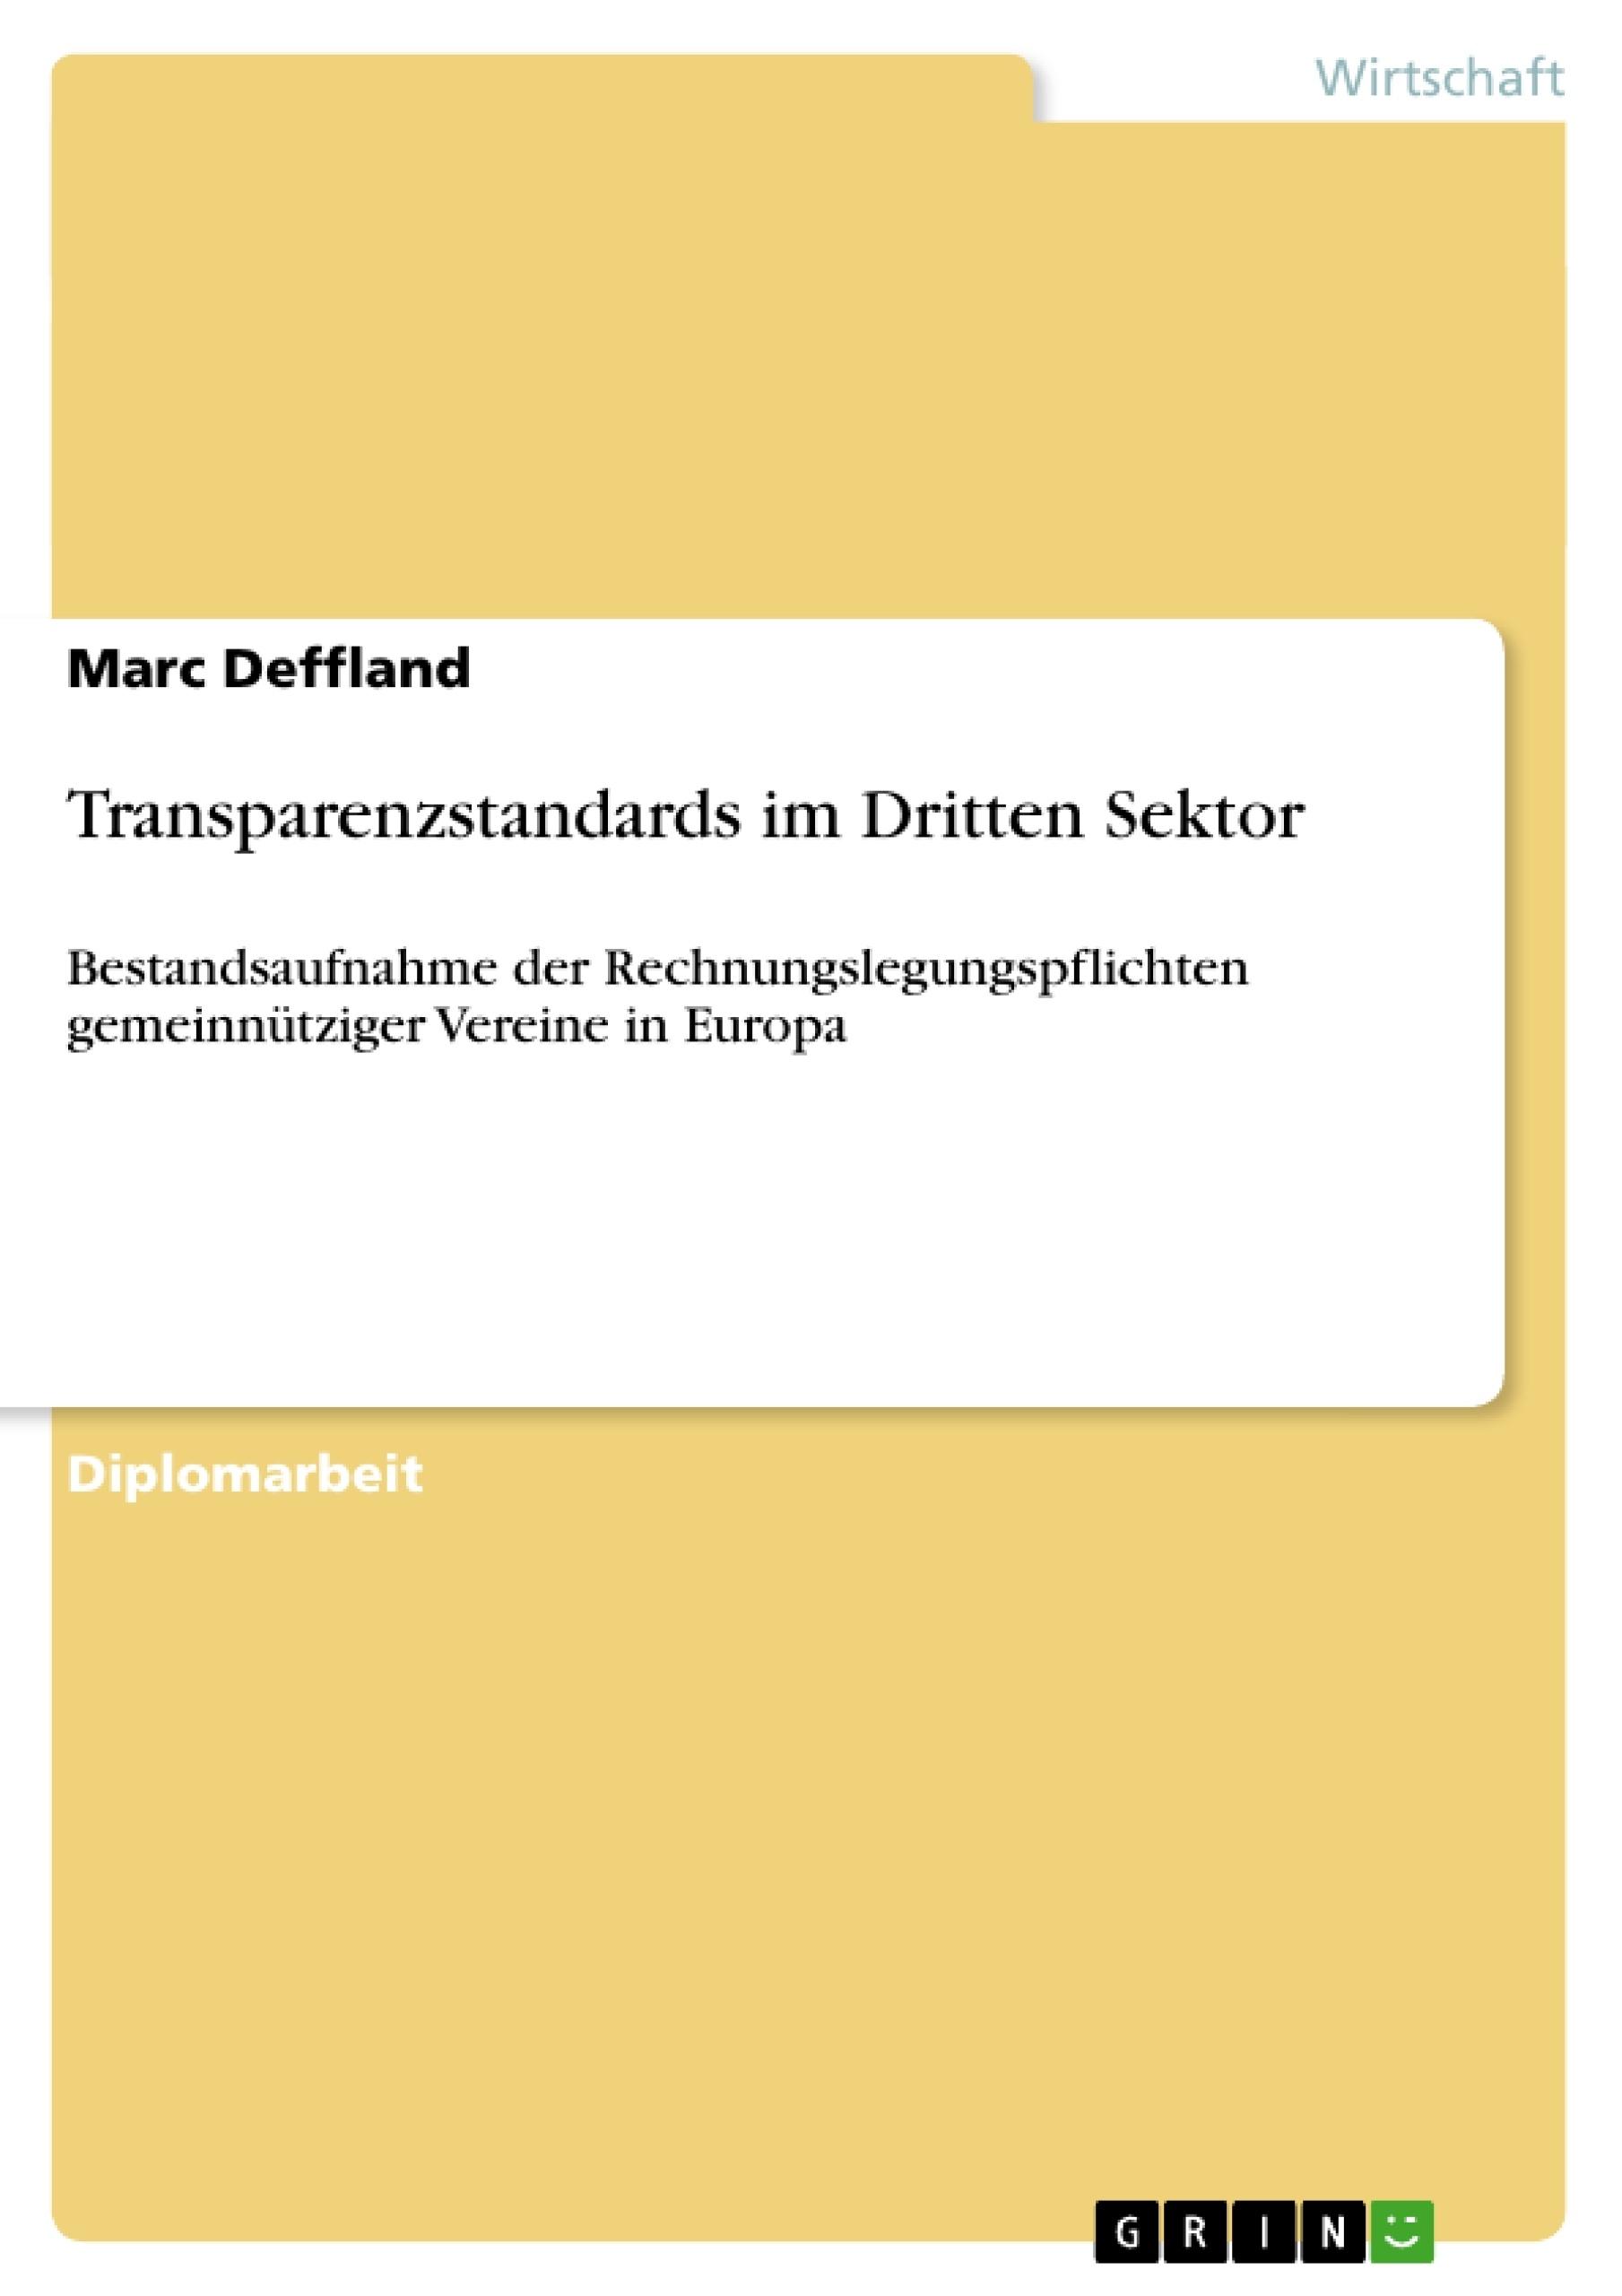 Titel: Transparenzstandards im Dritten Sektor